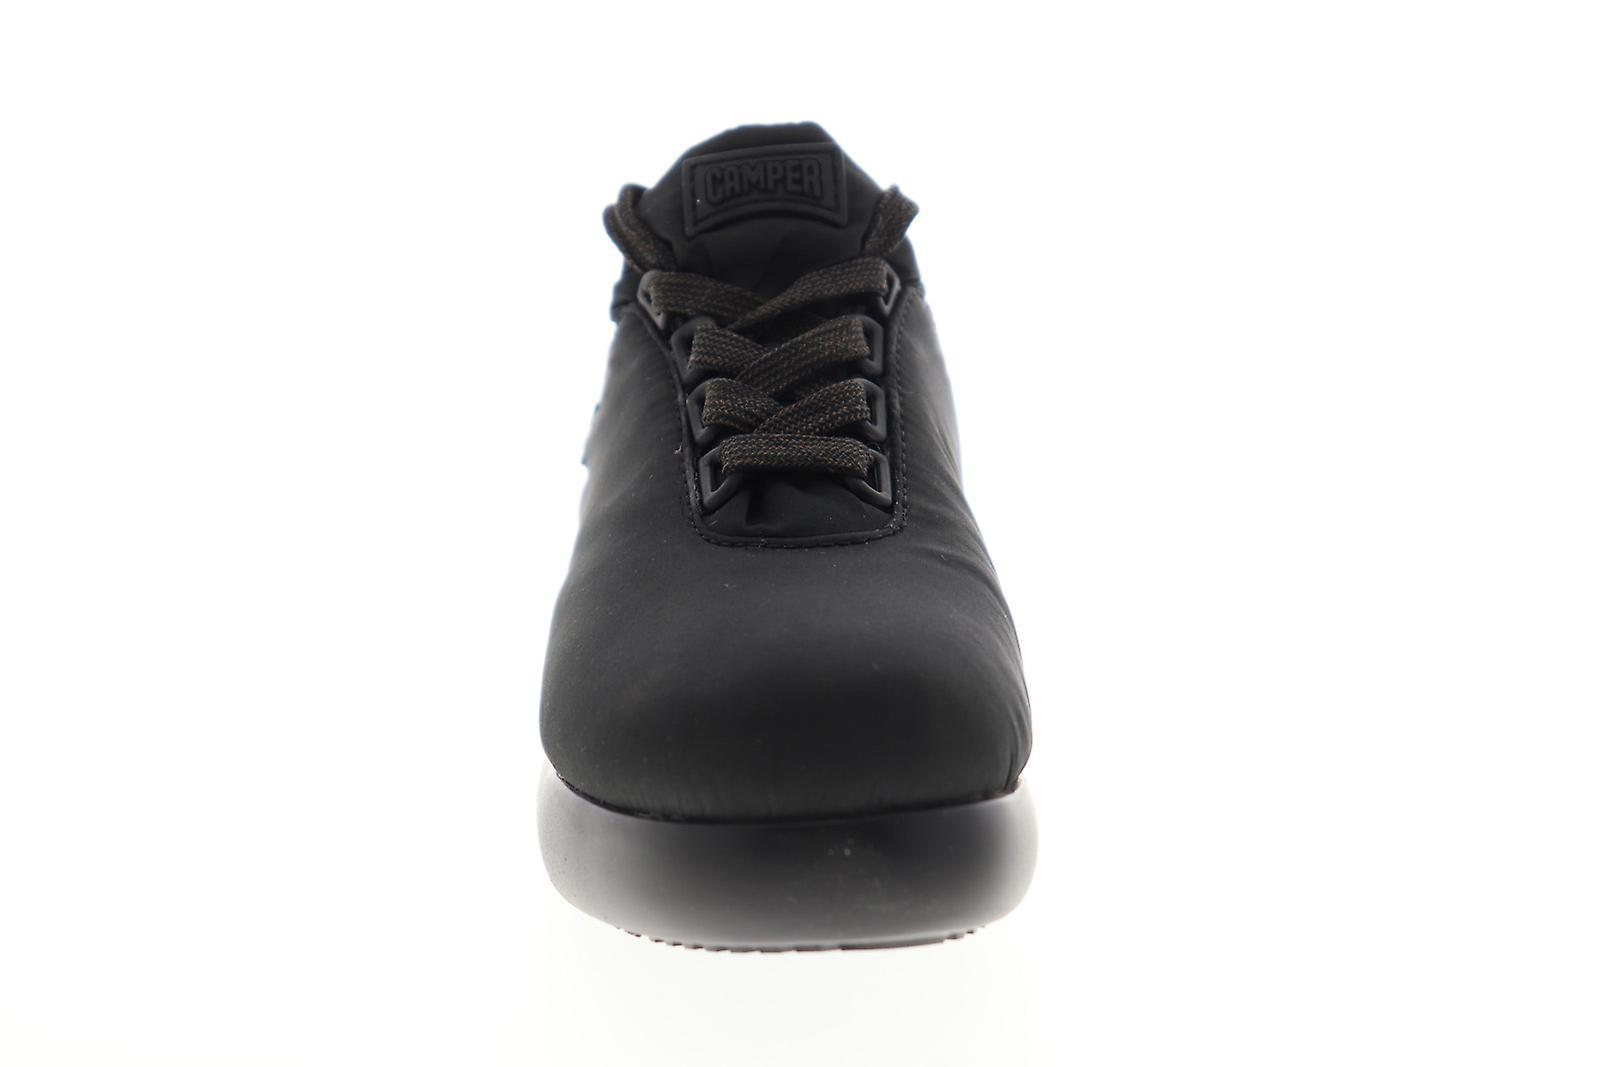 Camper Fiss Dame Sort Lærred Lace Up Low Top Sneakers Sko